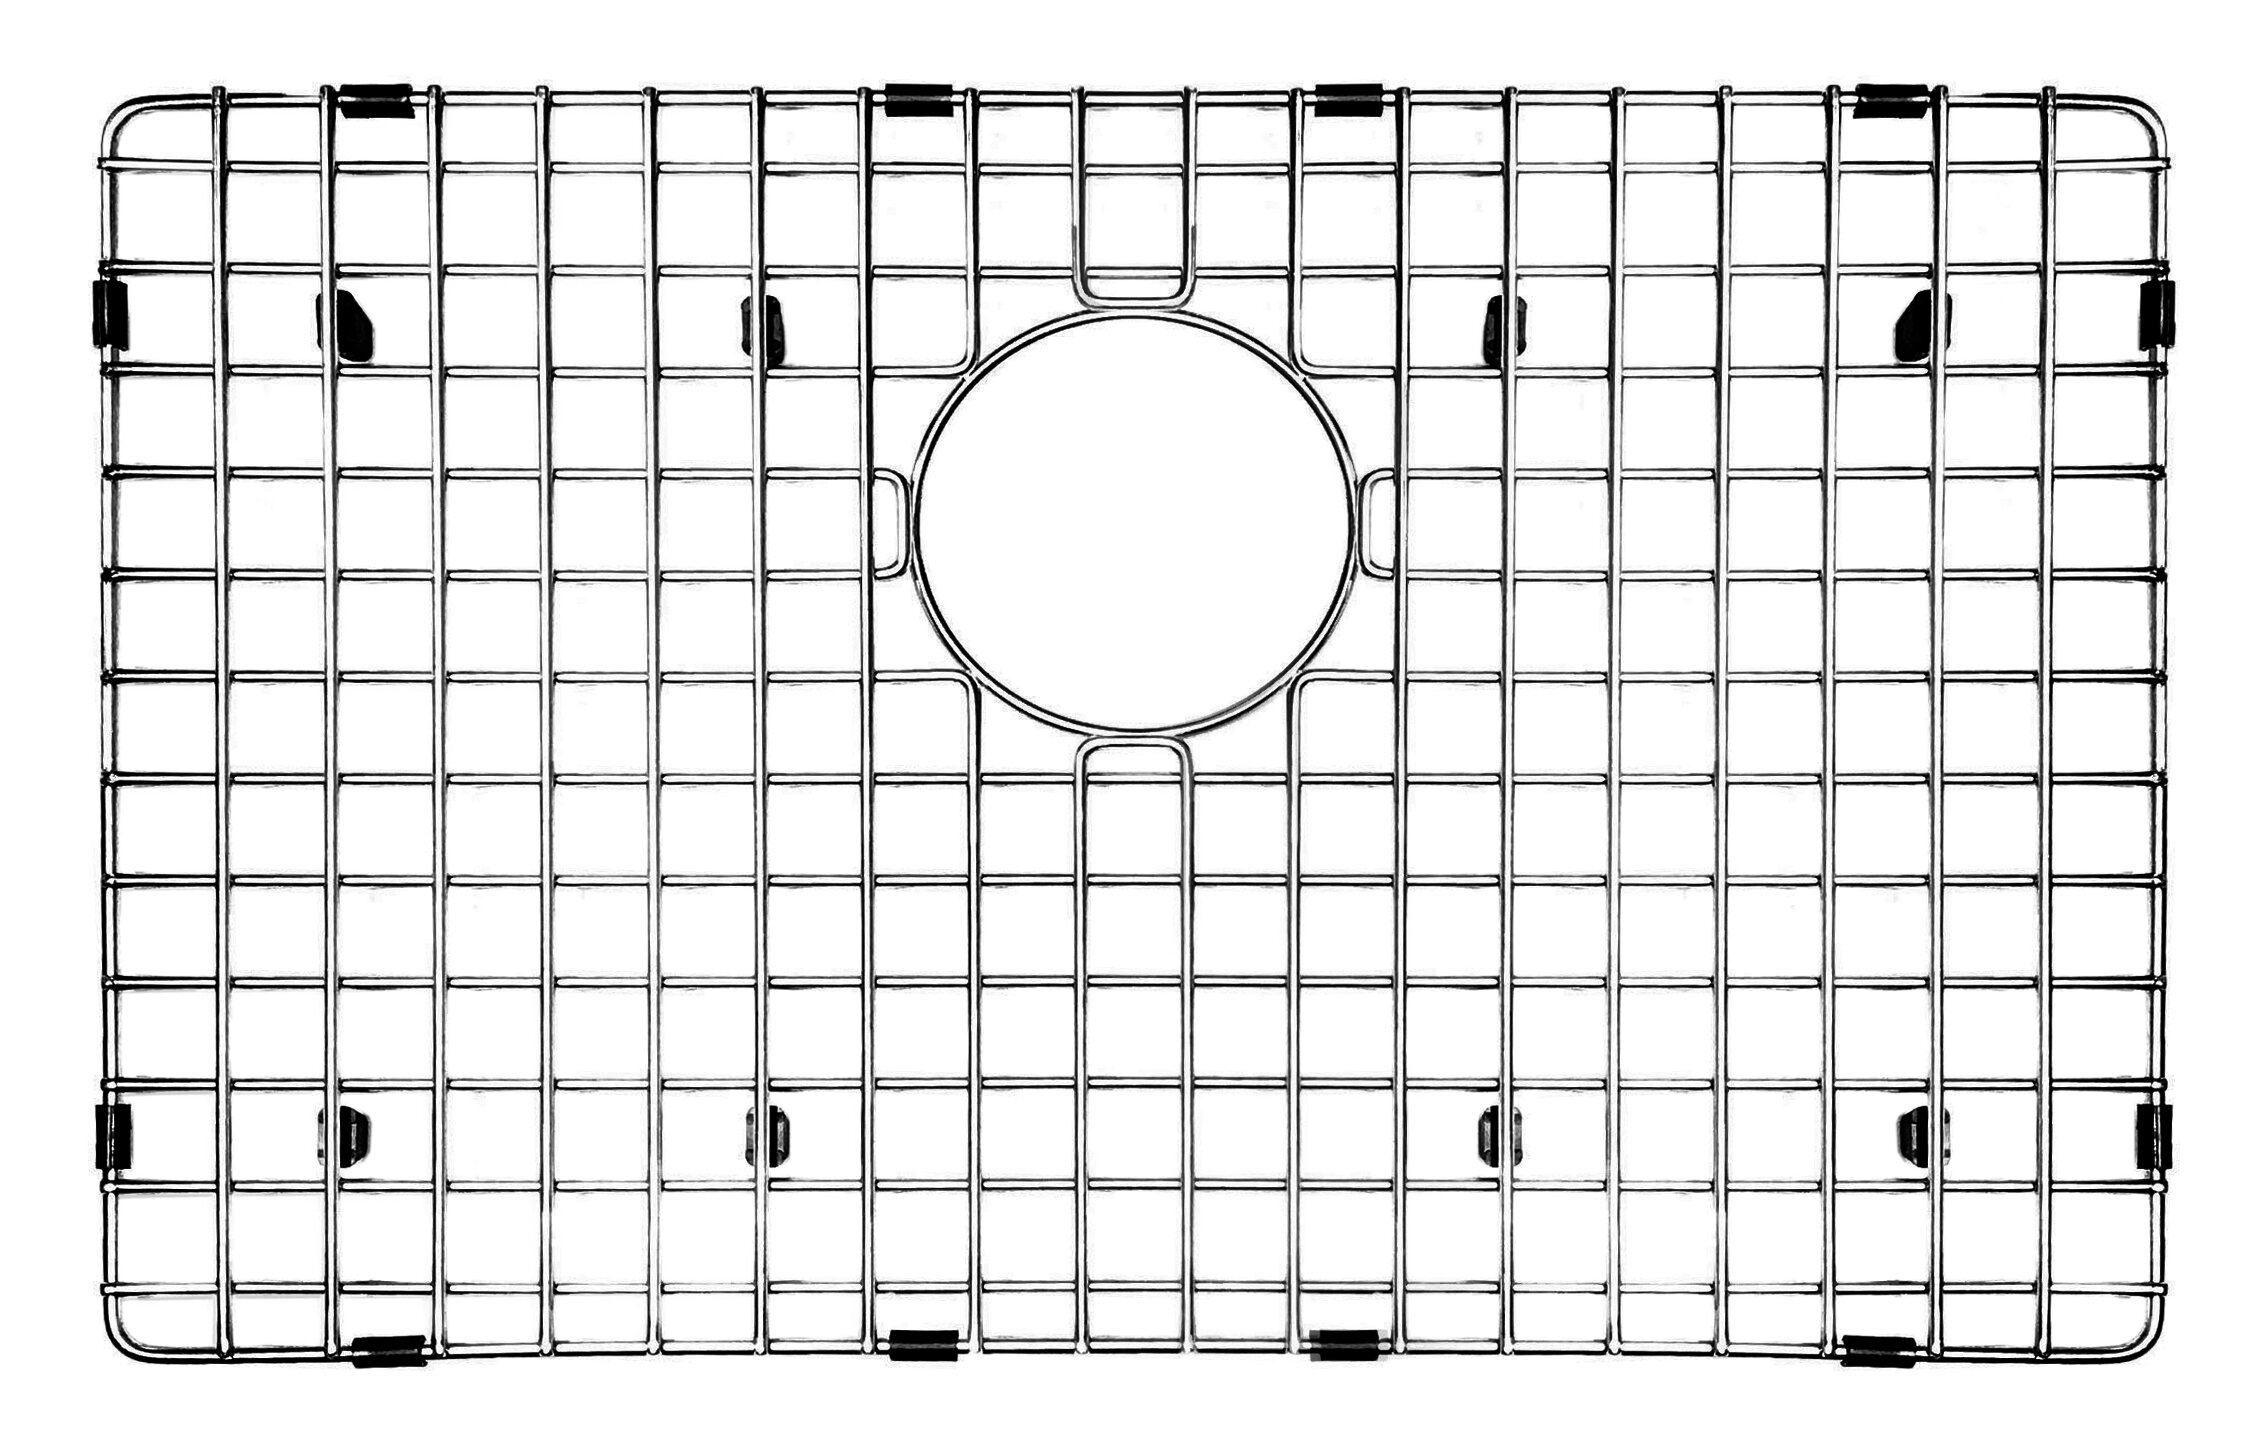 Daweier 23 X 15 Sink Grid Reviews Wayfair